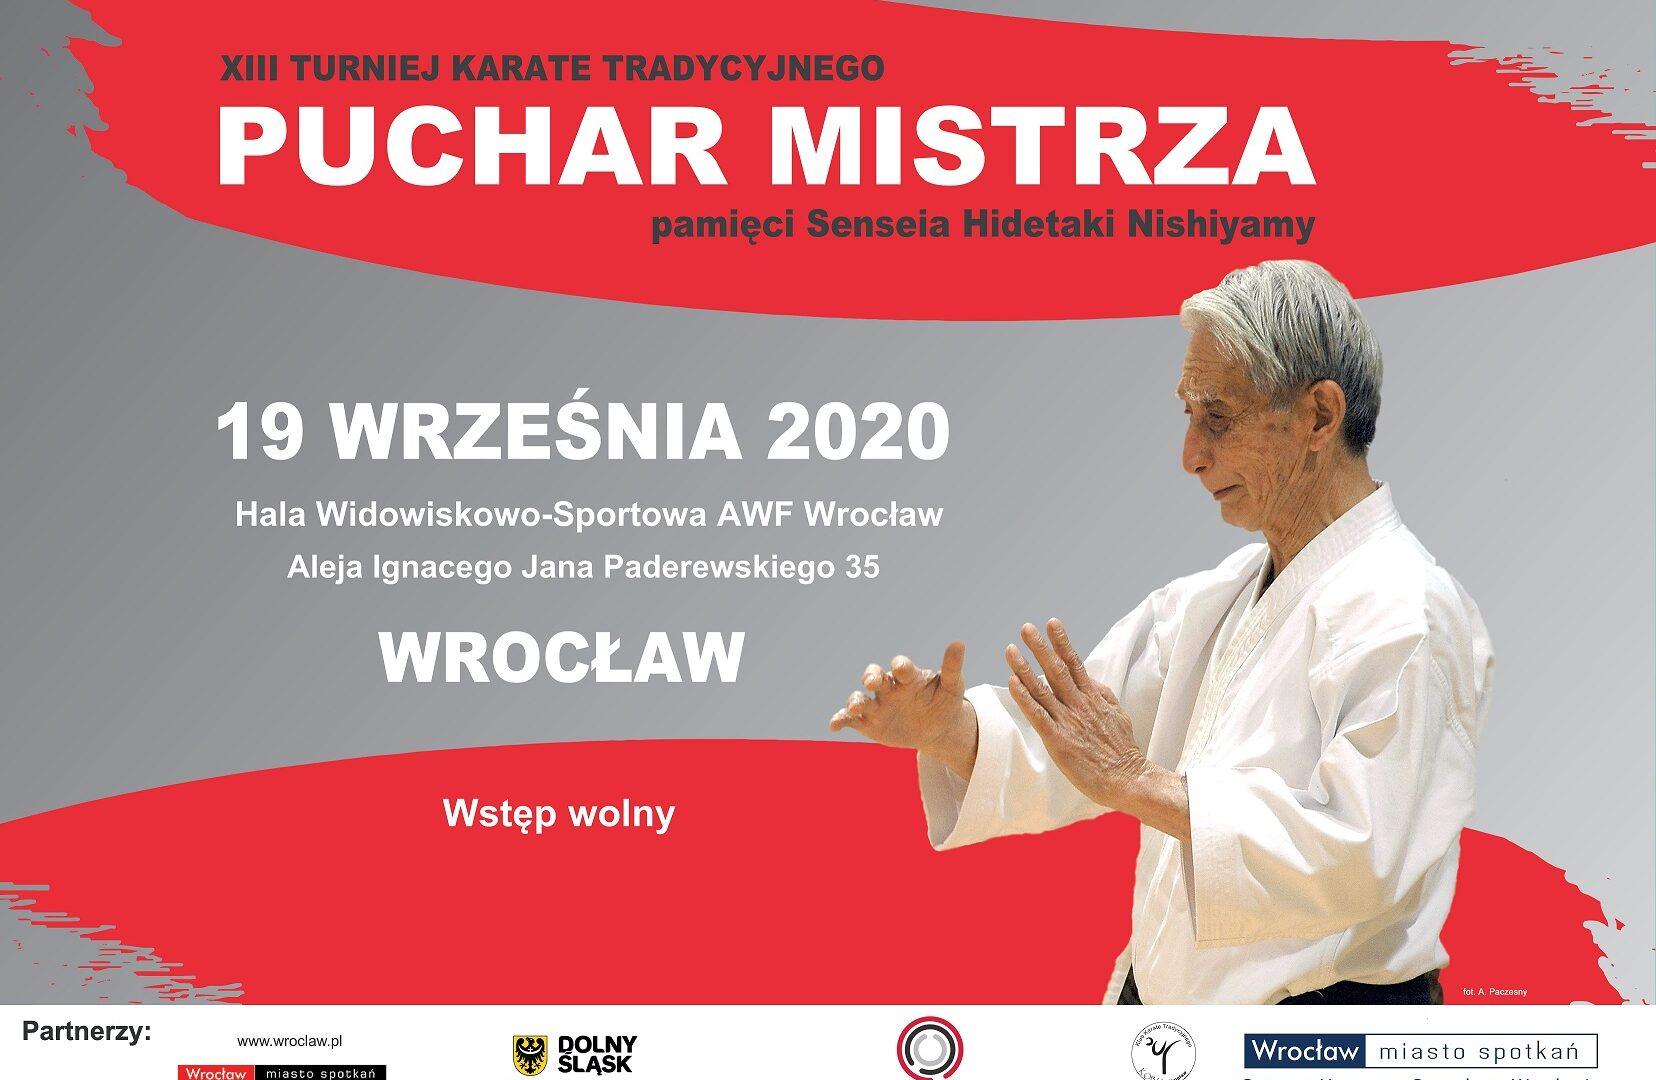 XIII PUCHAR MISTRZA 2020